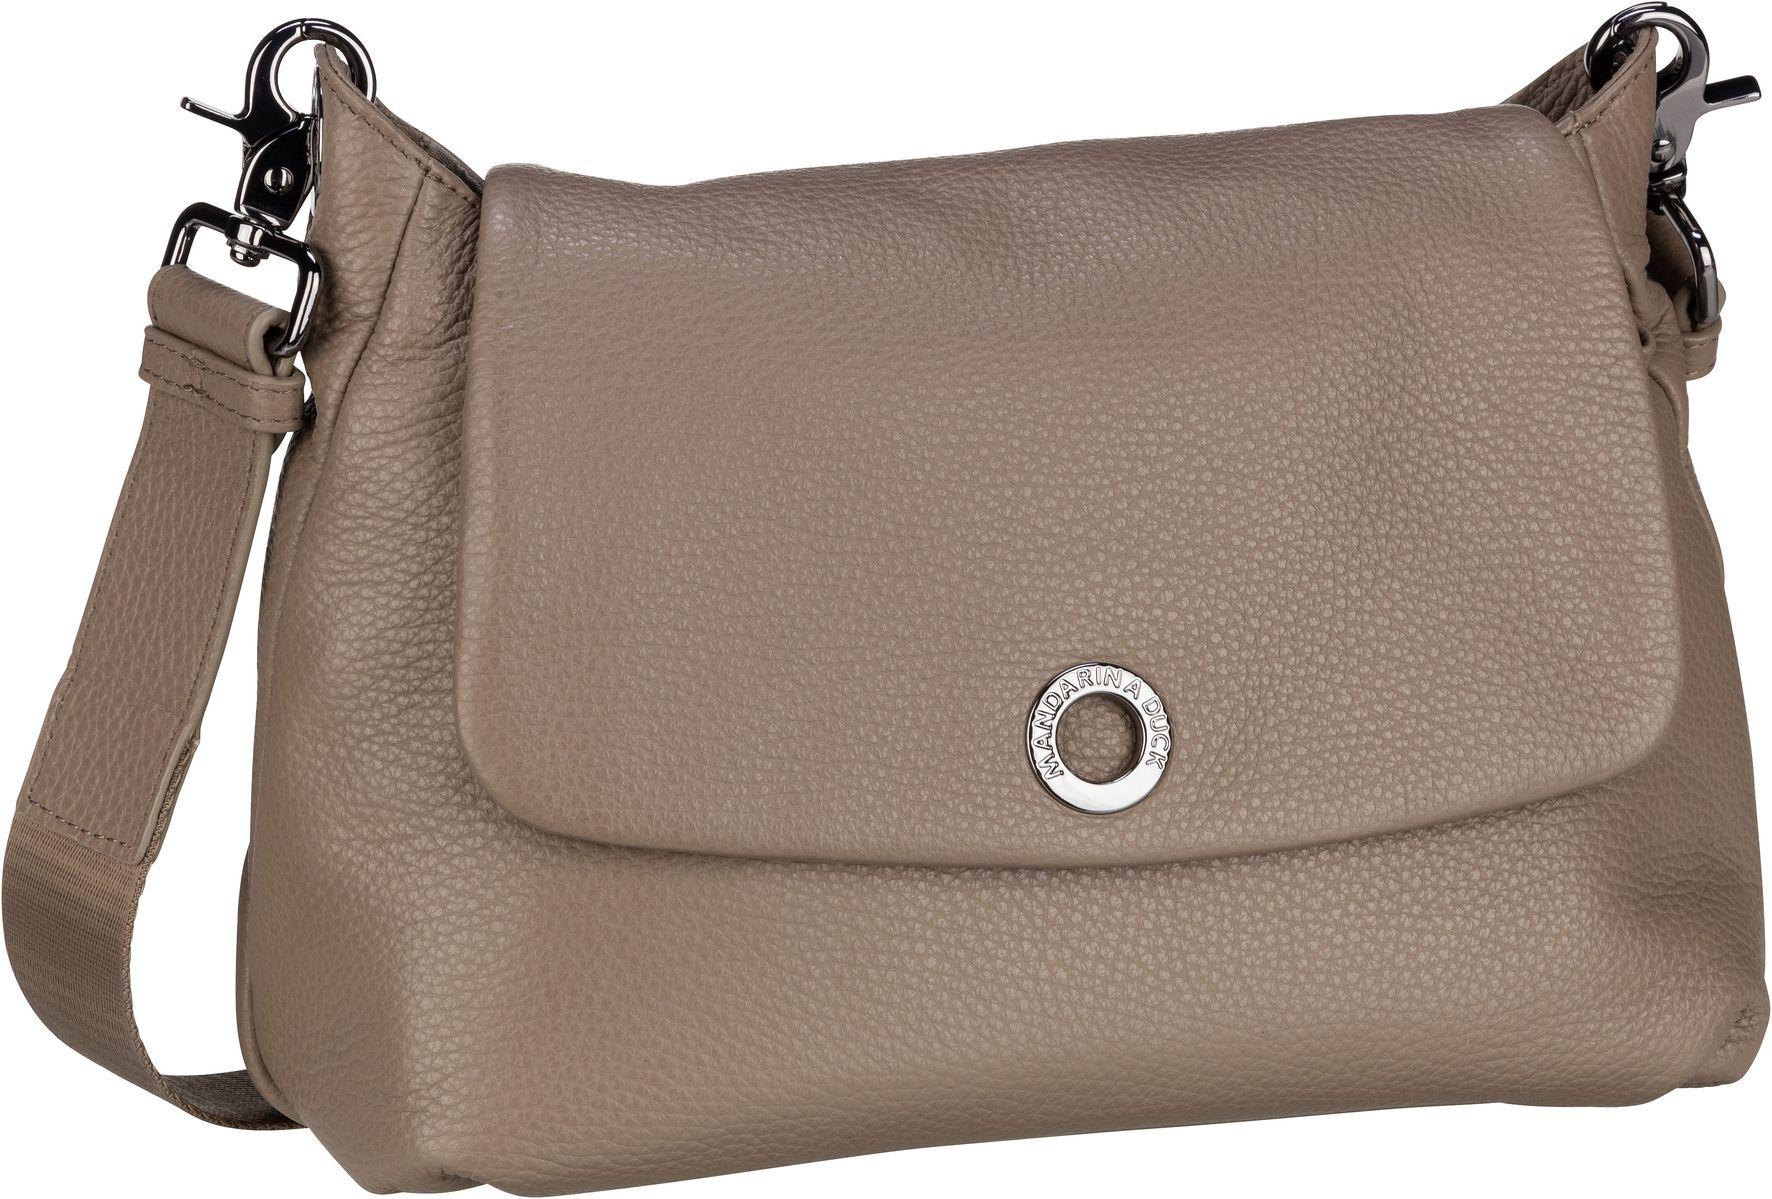 Umhängetasche Mellow Leather Small Shoulder Bag FZT31 Amphora